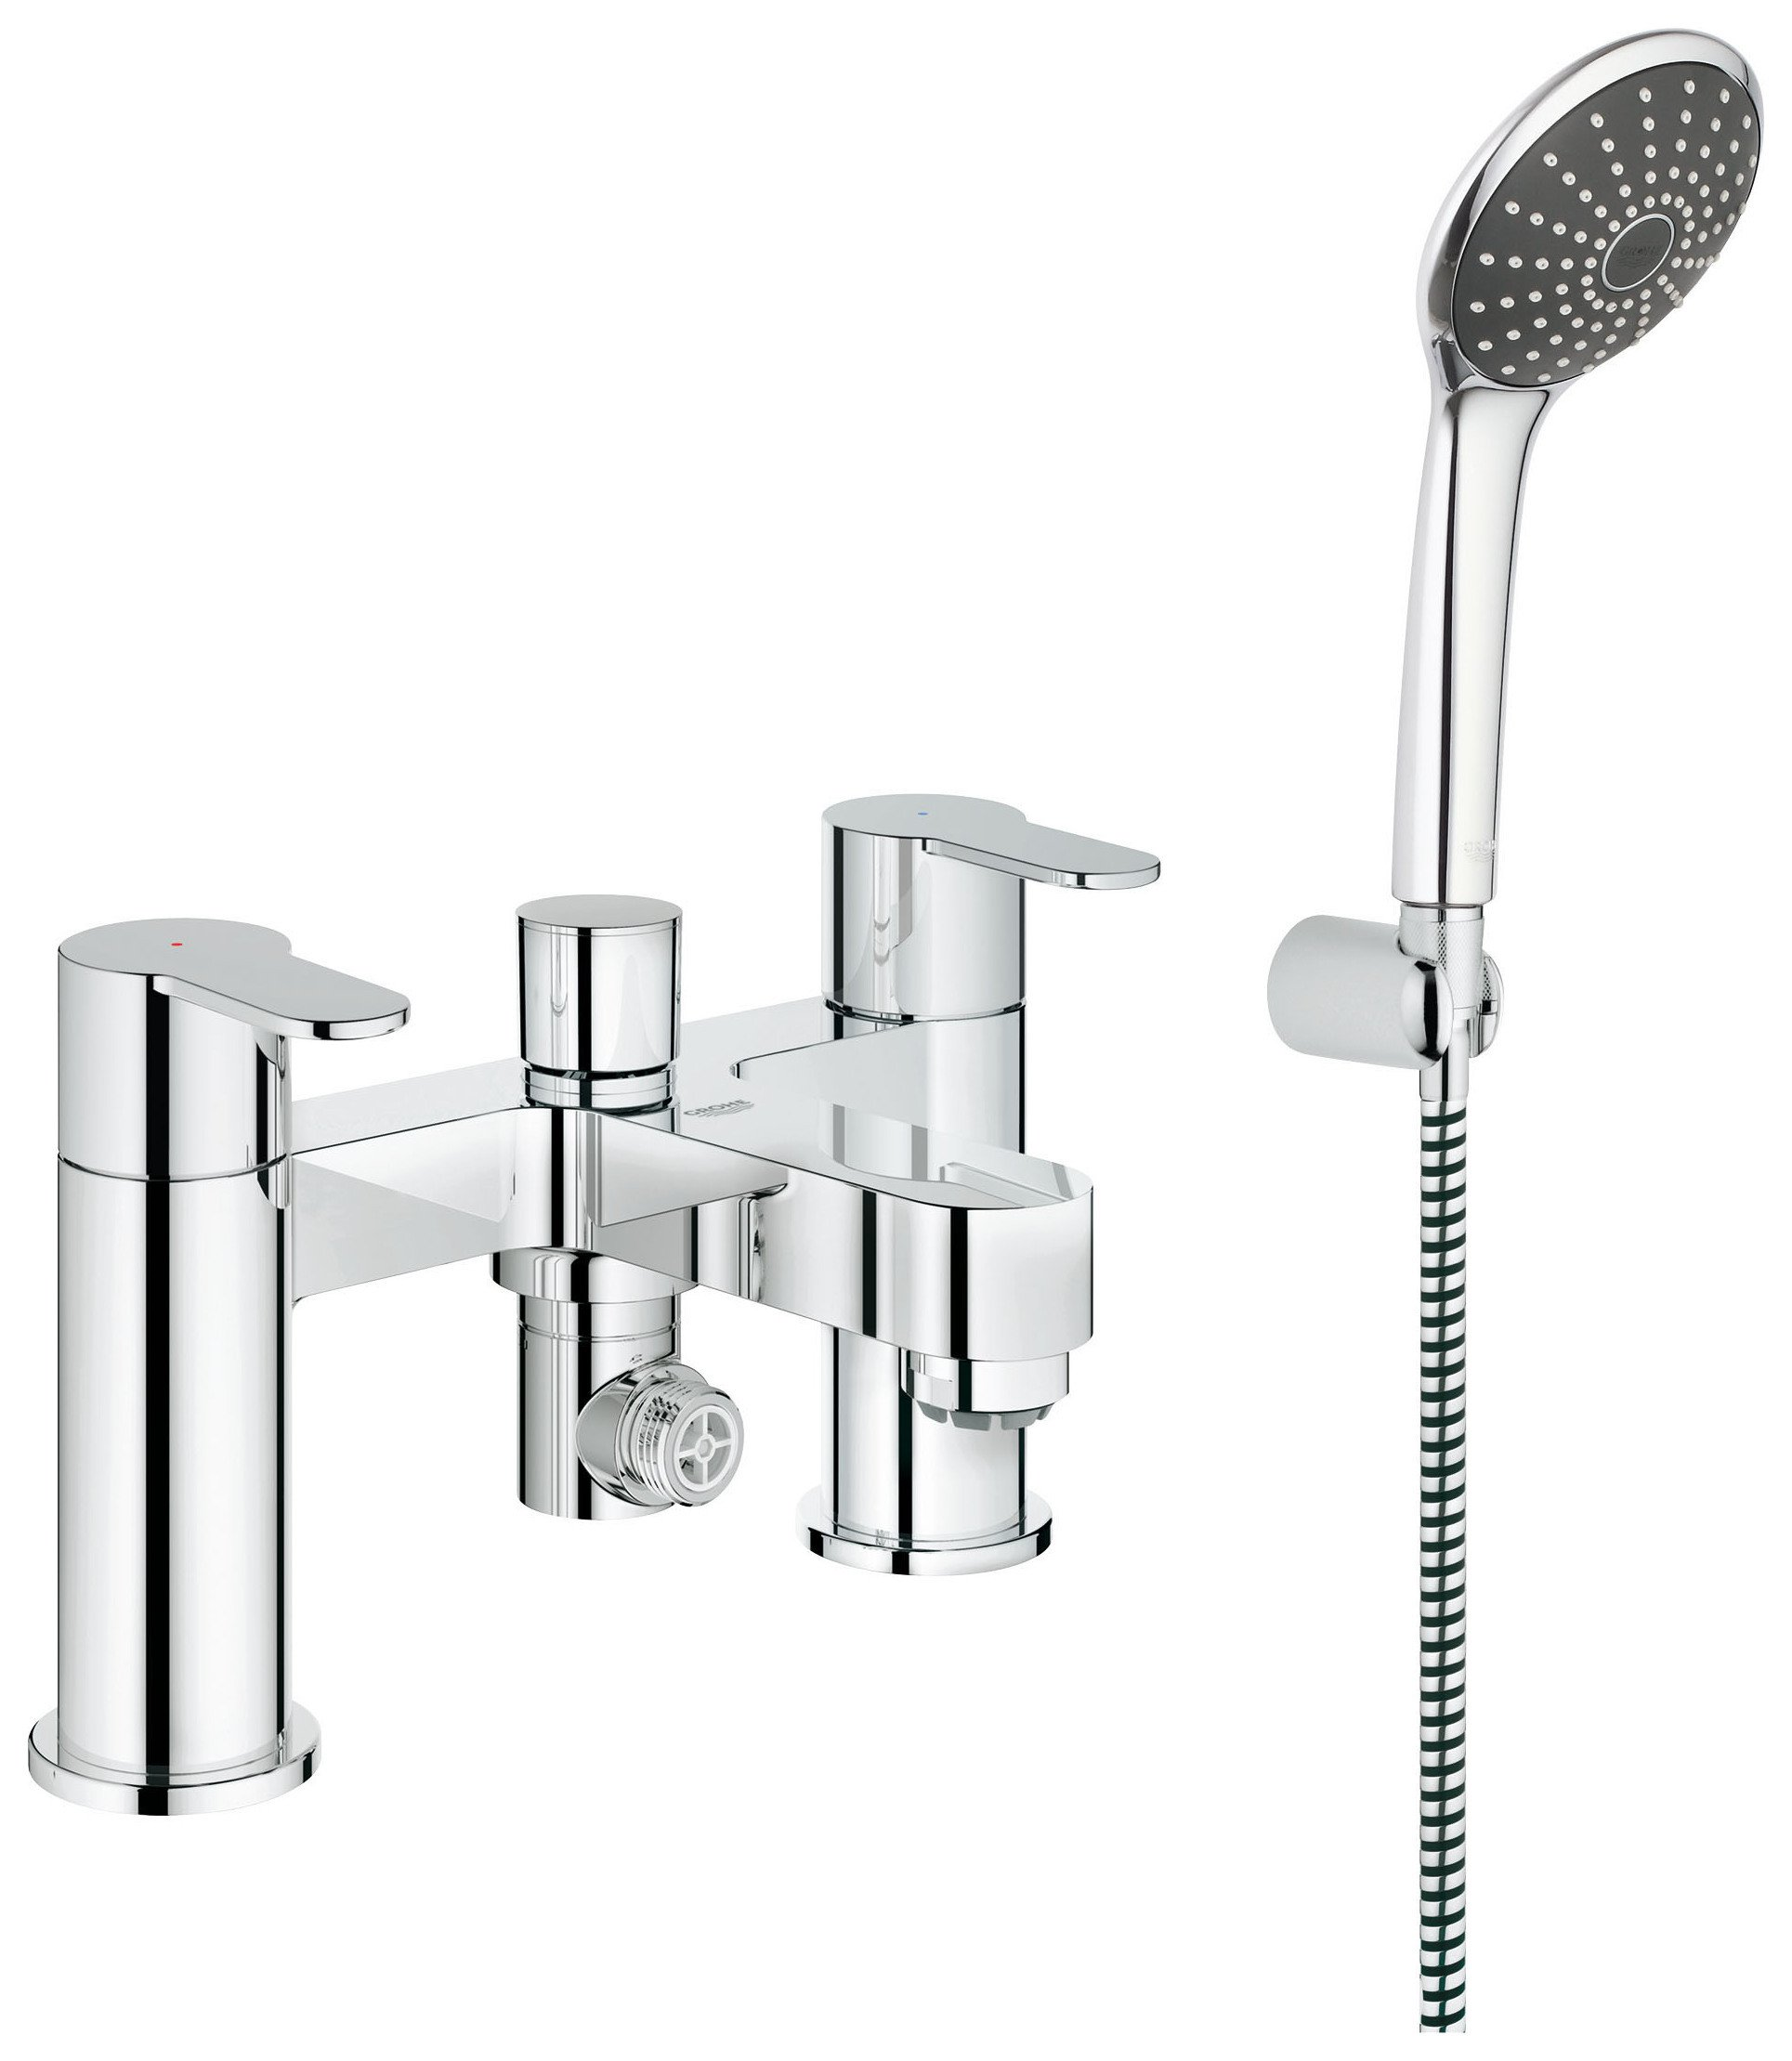 grohe wave cosmopolitan bath and shower mixer set gay. Black Bedroom Furniture Sets. Home Design Ideas